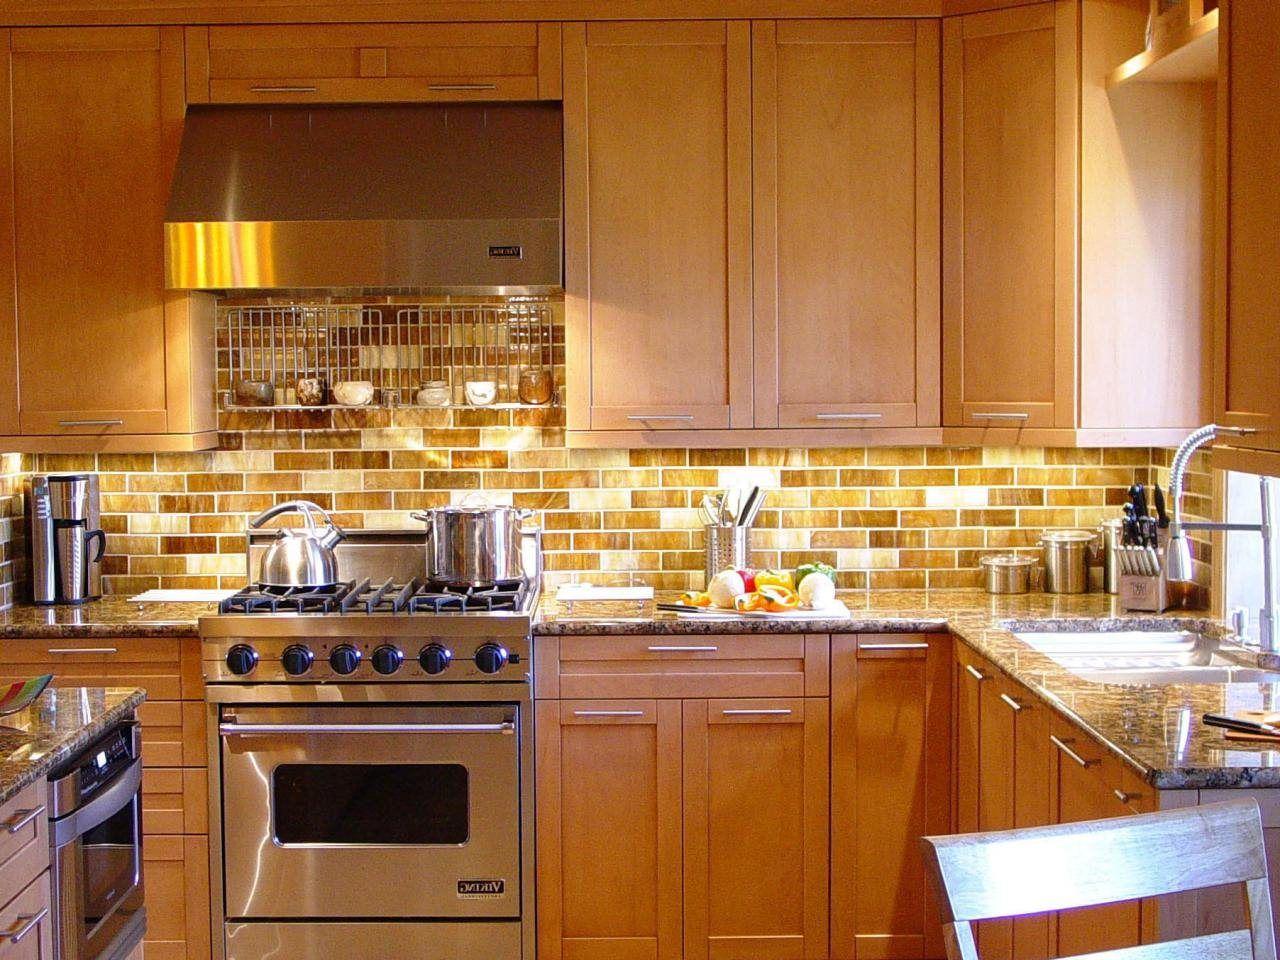 Black Subway Tile Kitchen Backsplash Choices New White With Awesome Design Ideas